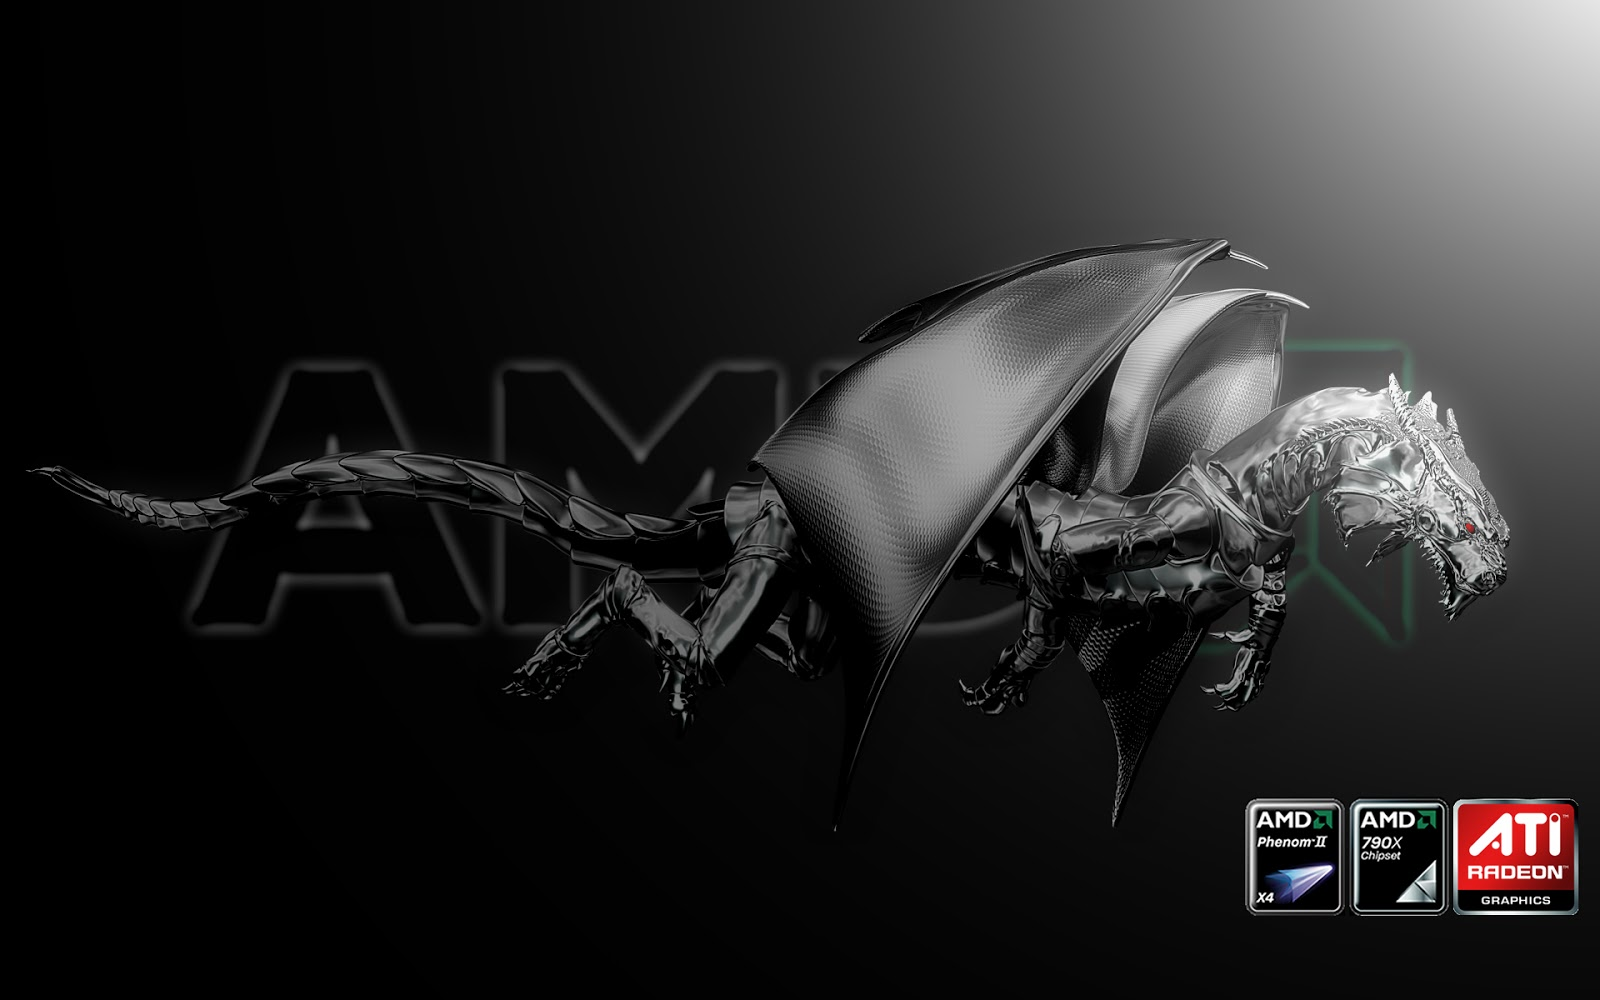 Mystery Wallpaper AMD Phenom II X4 1600x1000